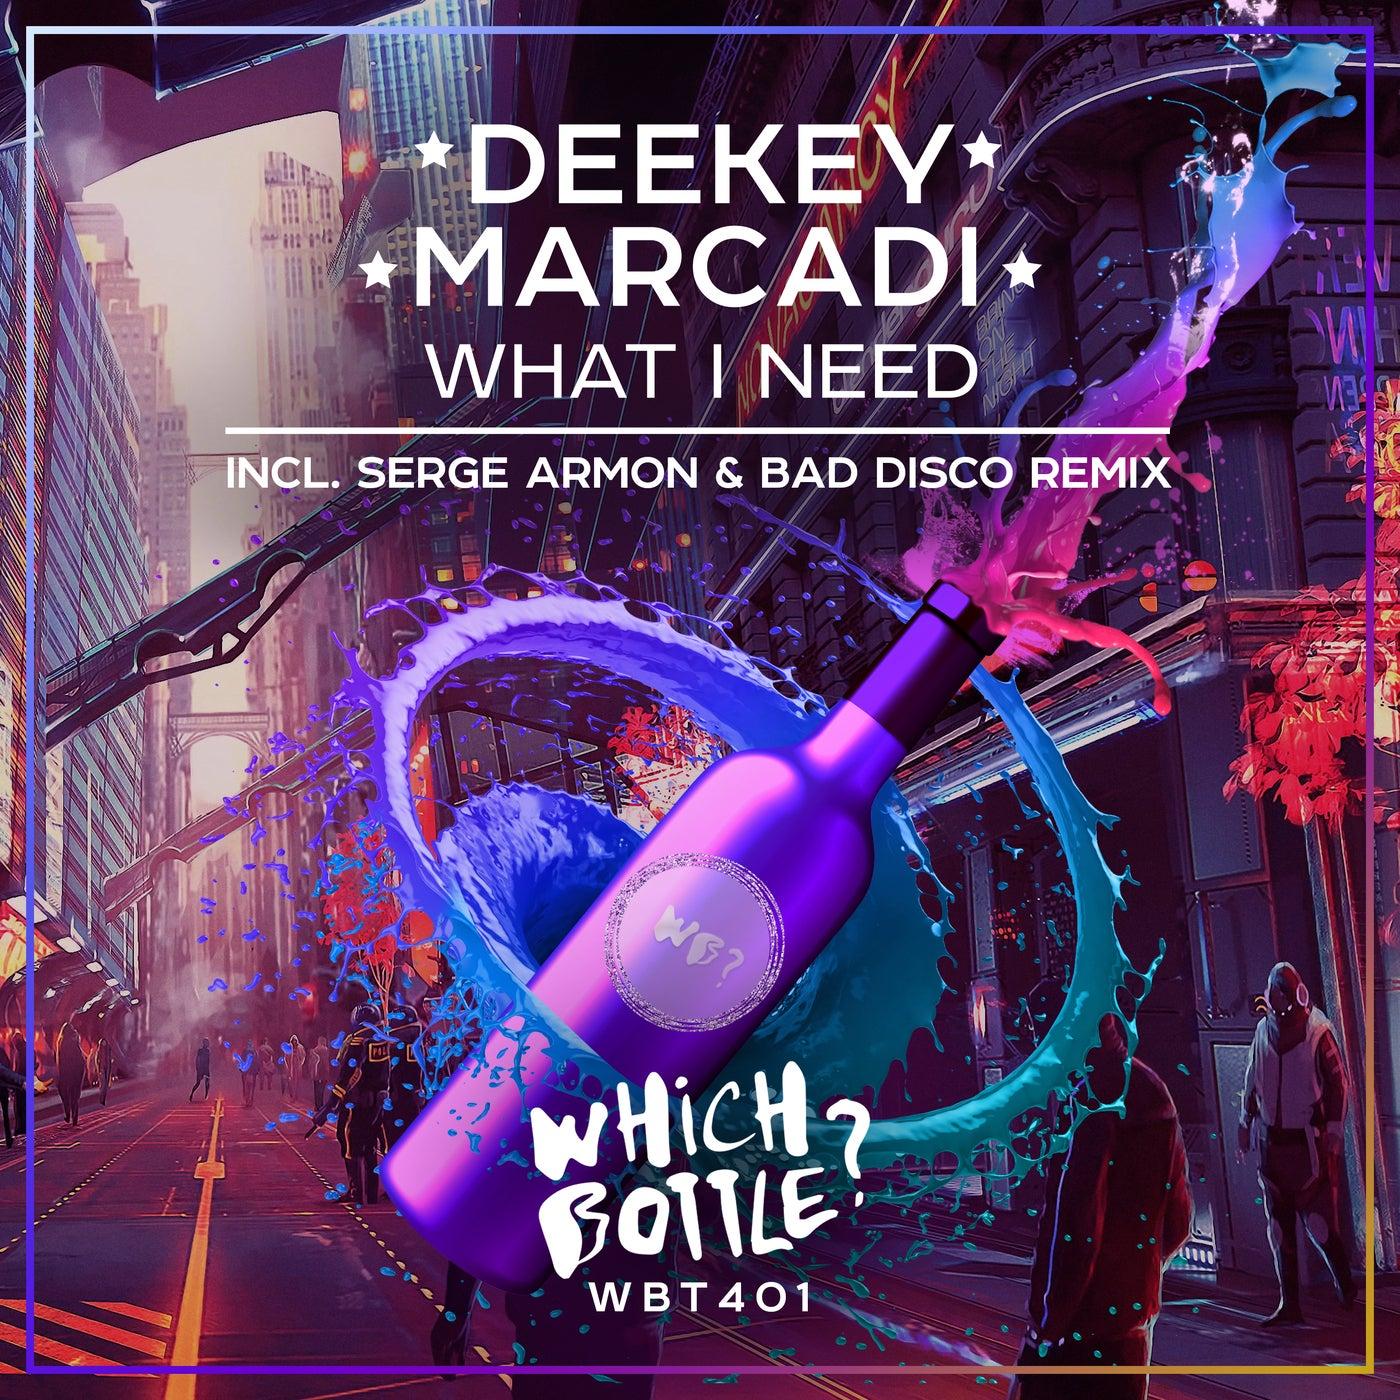 What I Need (Serge Armon & Bad Disco Remix)